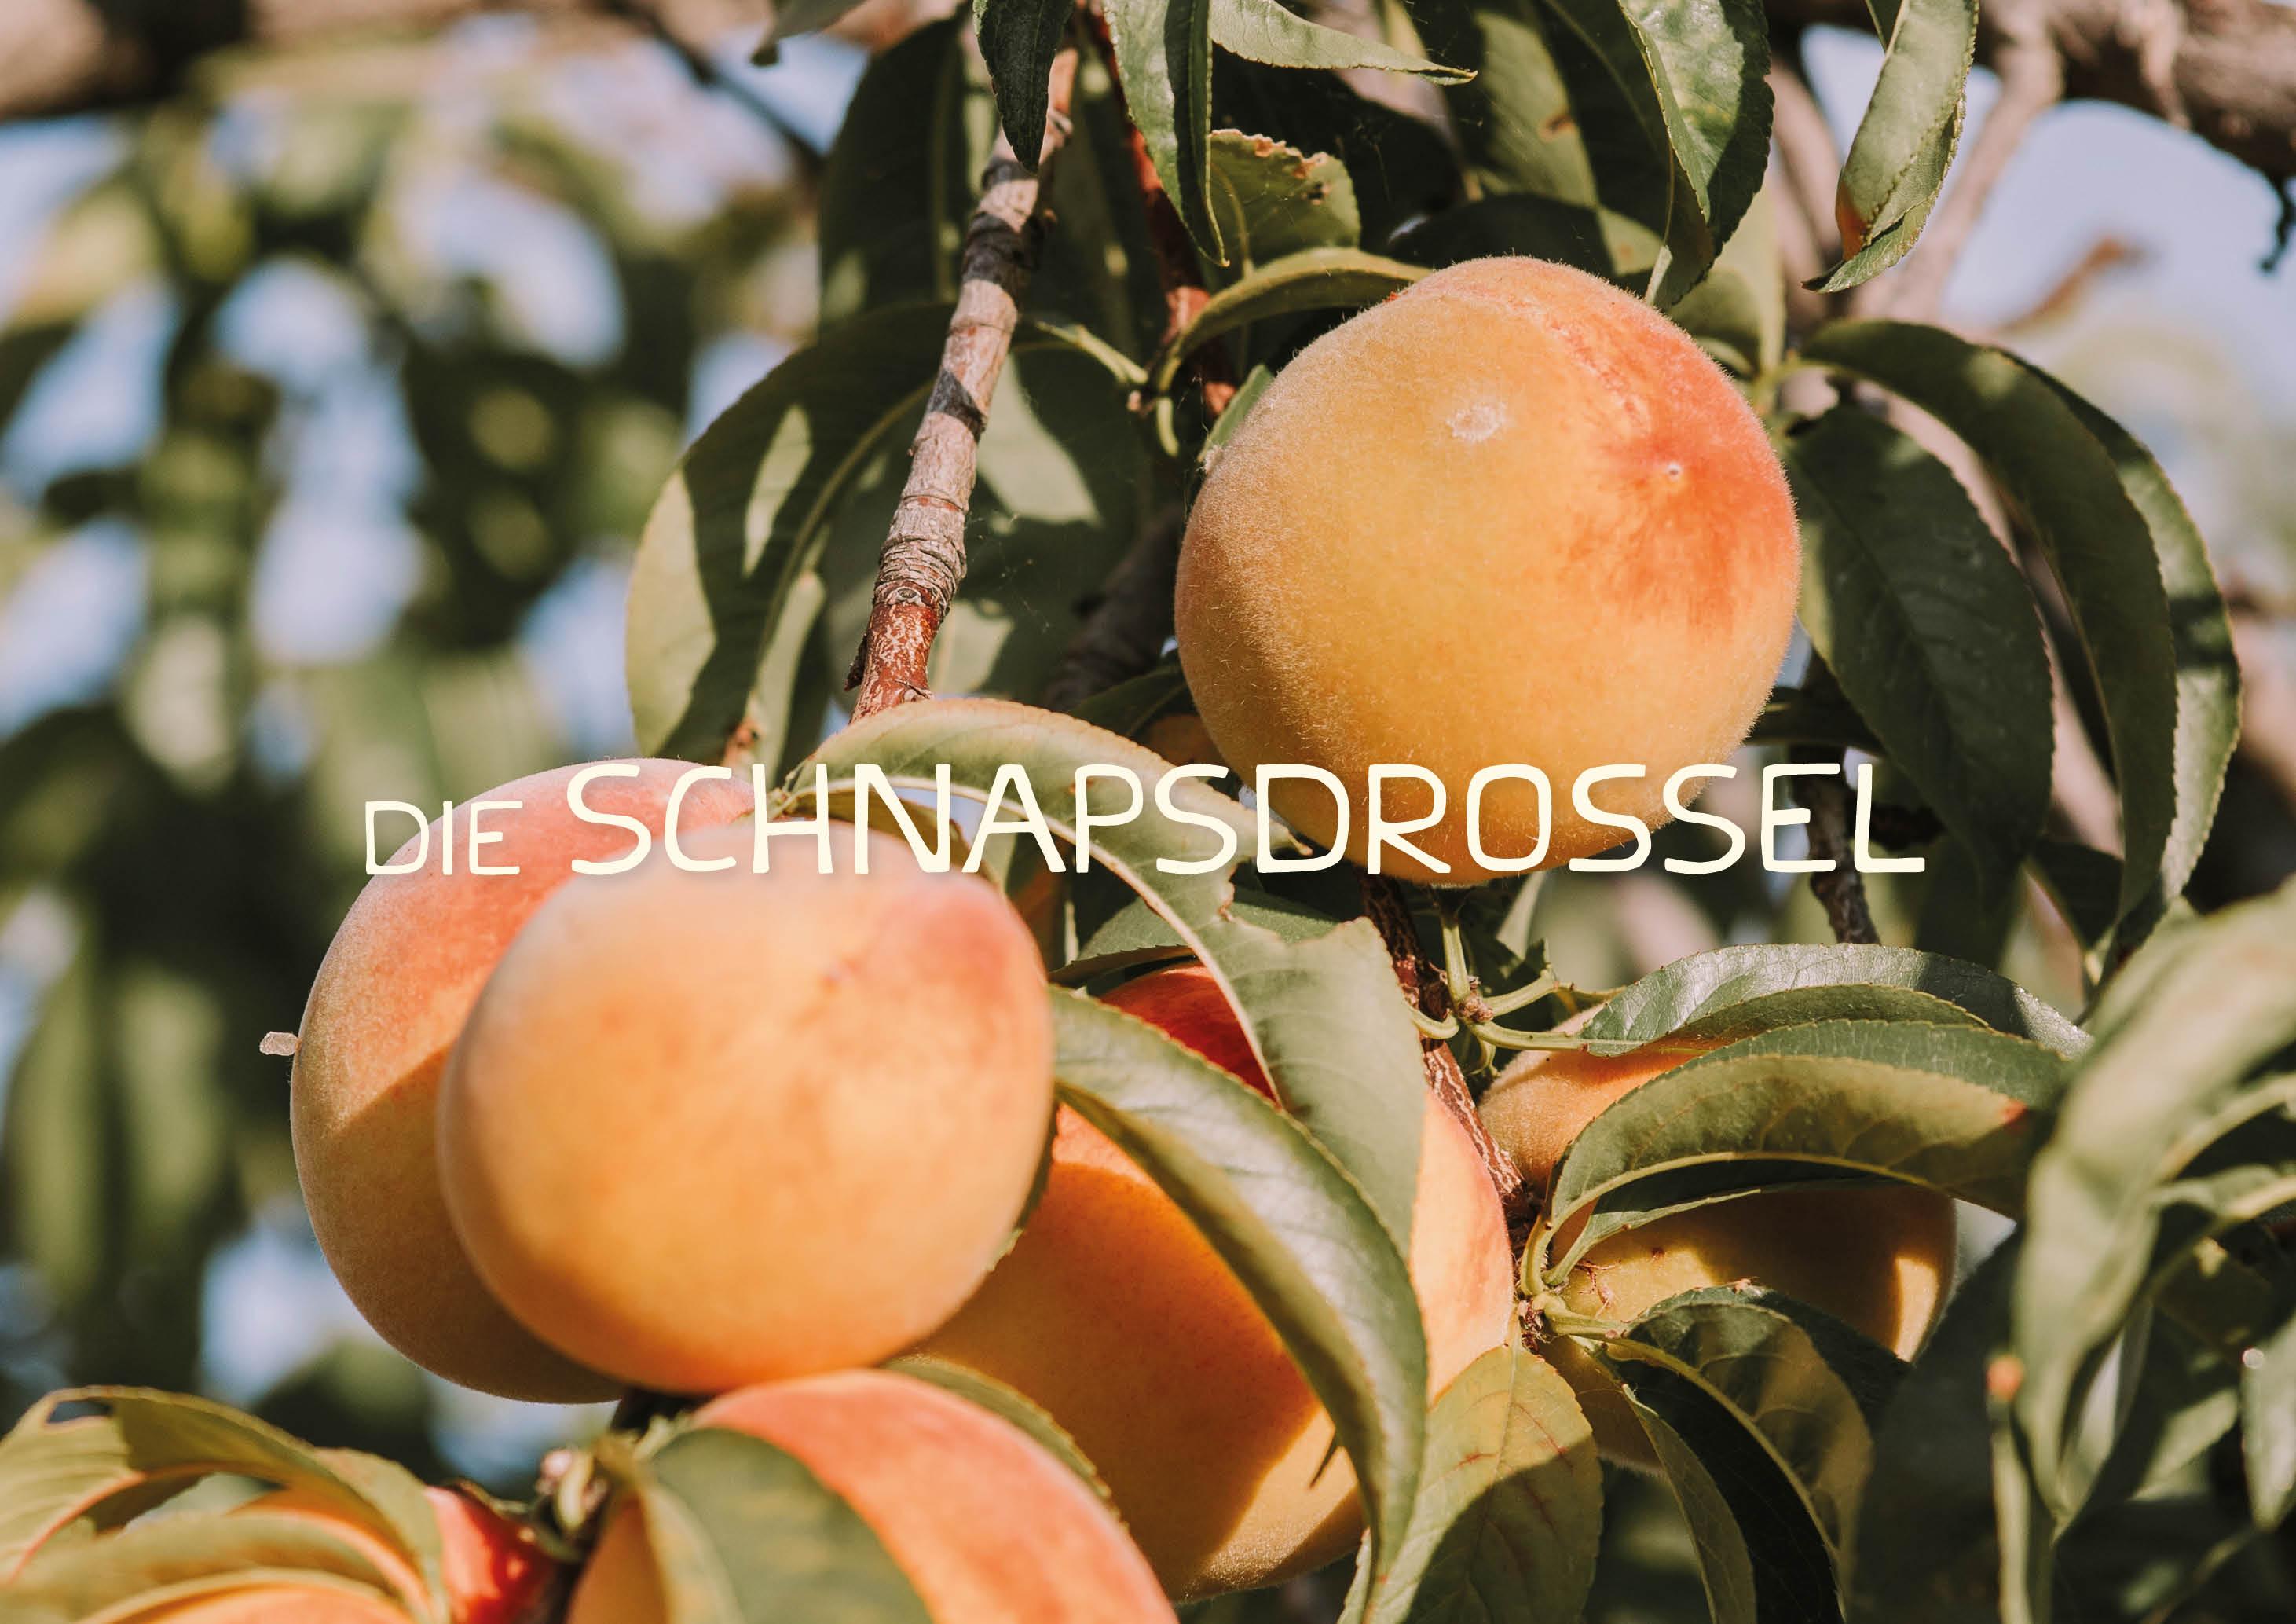 Schnapsdrossel brand identity - handmade typography - by Magdalena Weiss